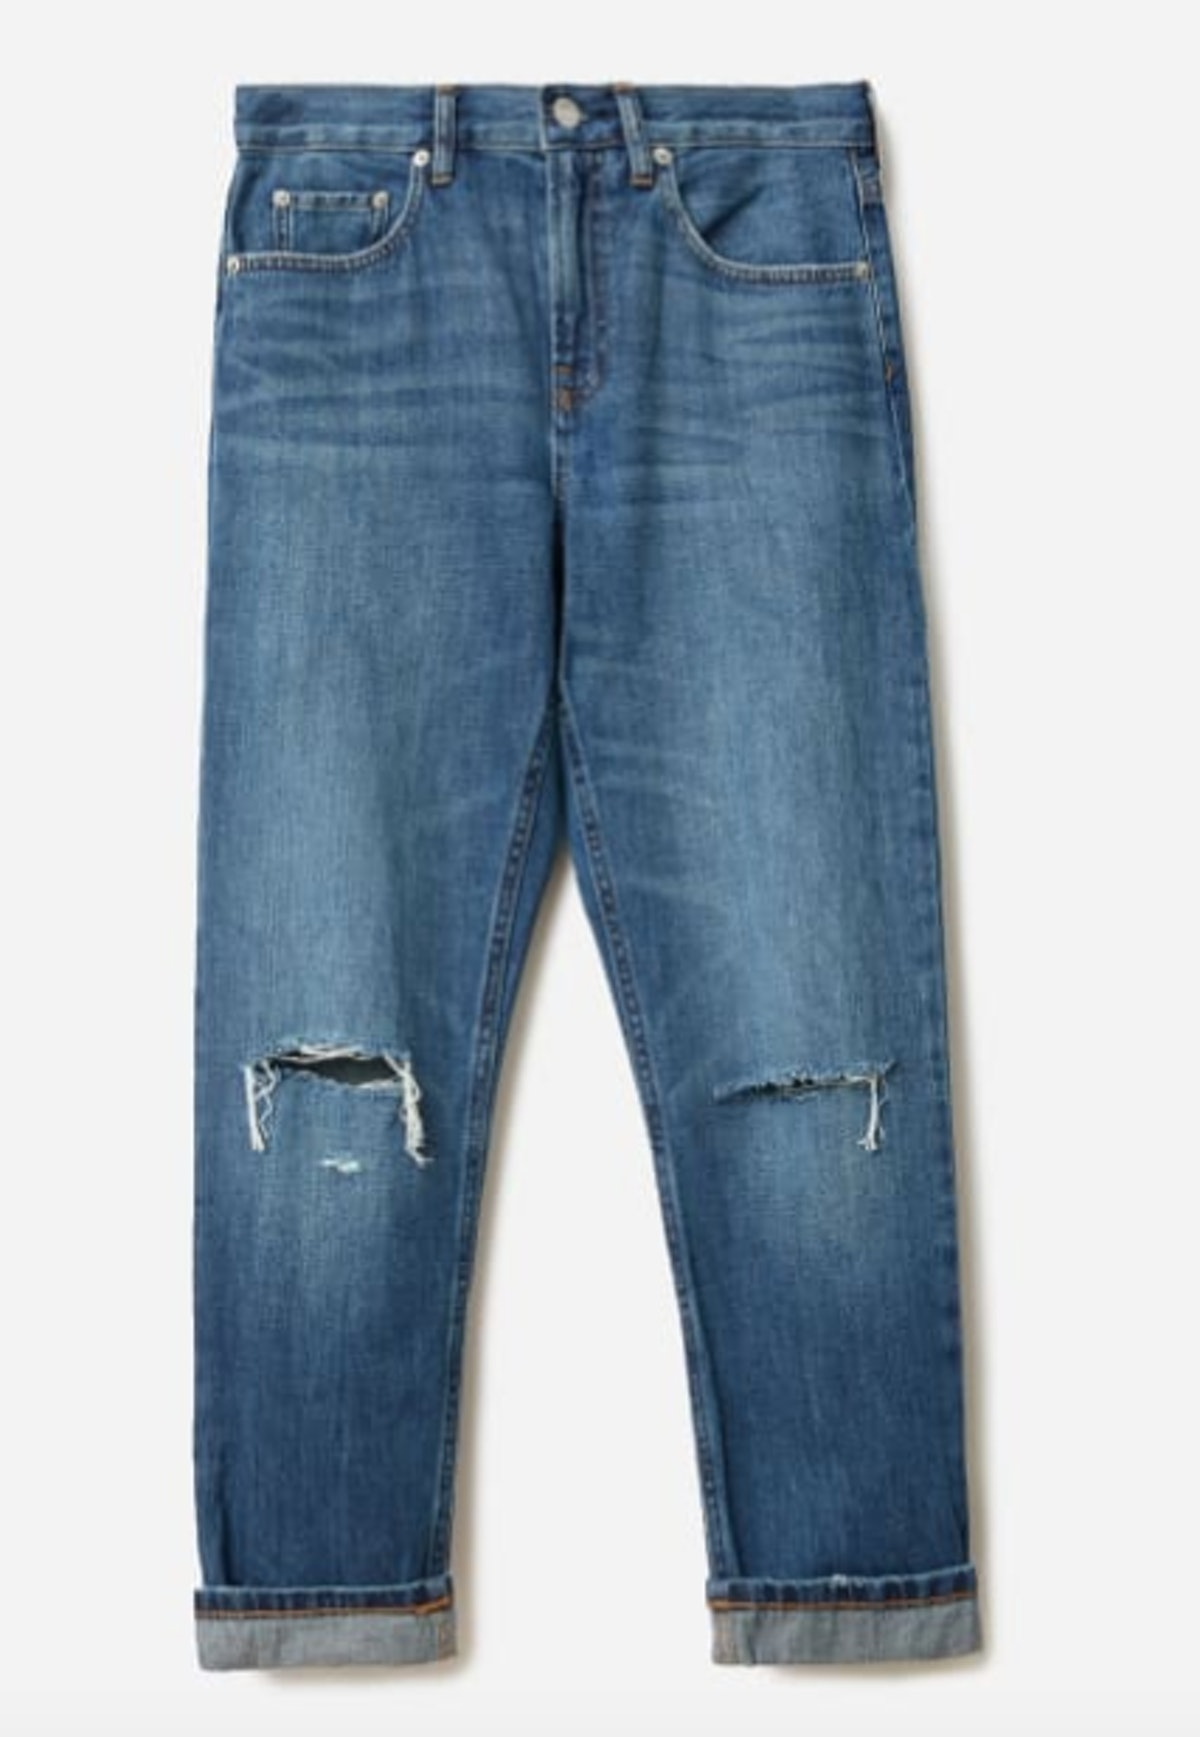 The Super-Soft Straight Leg Jean